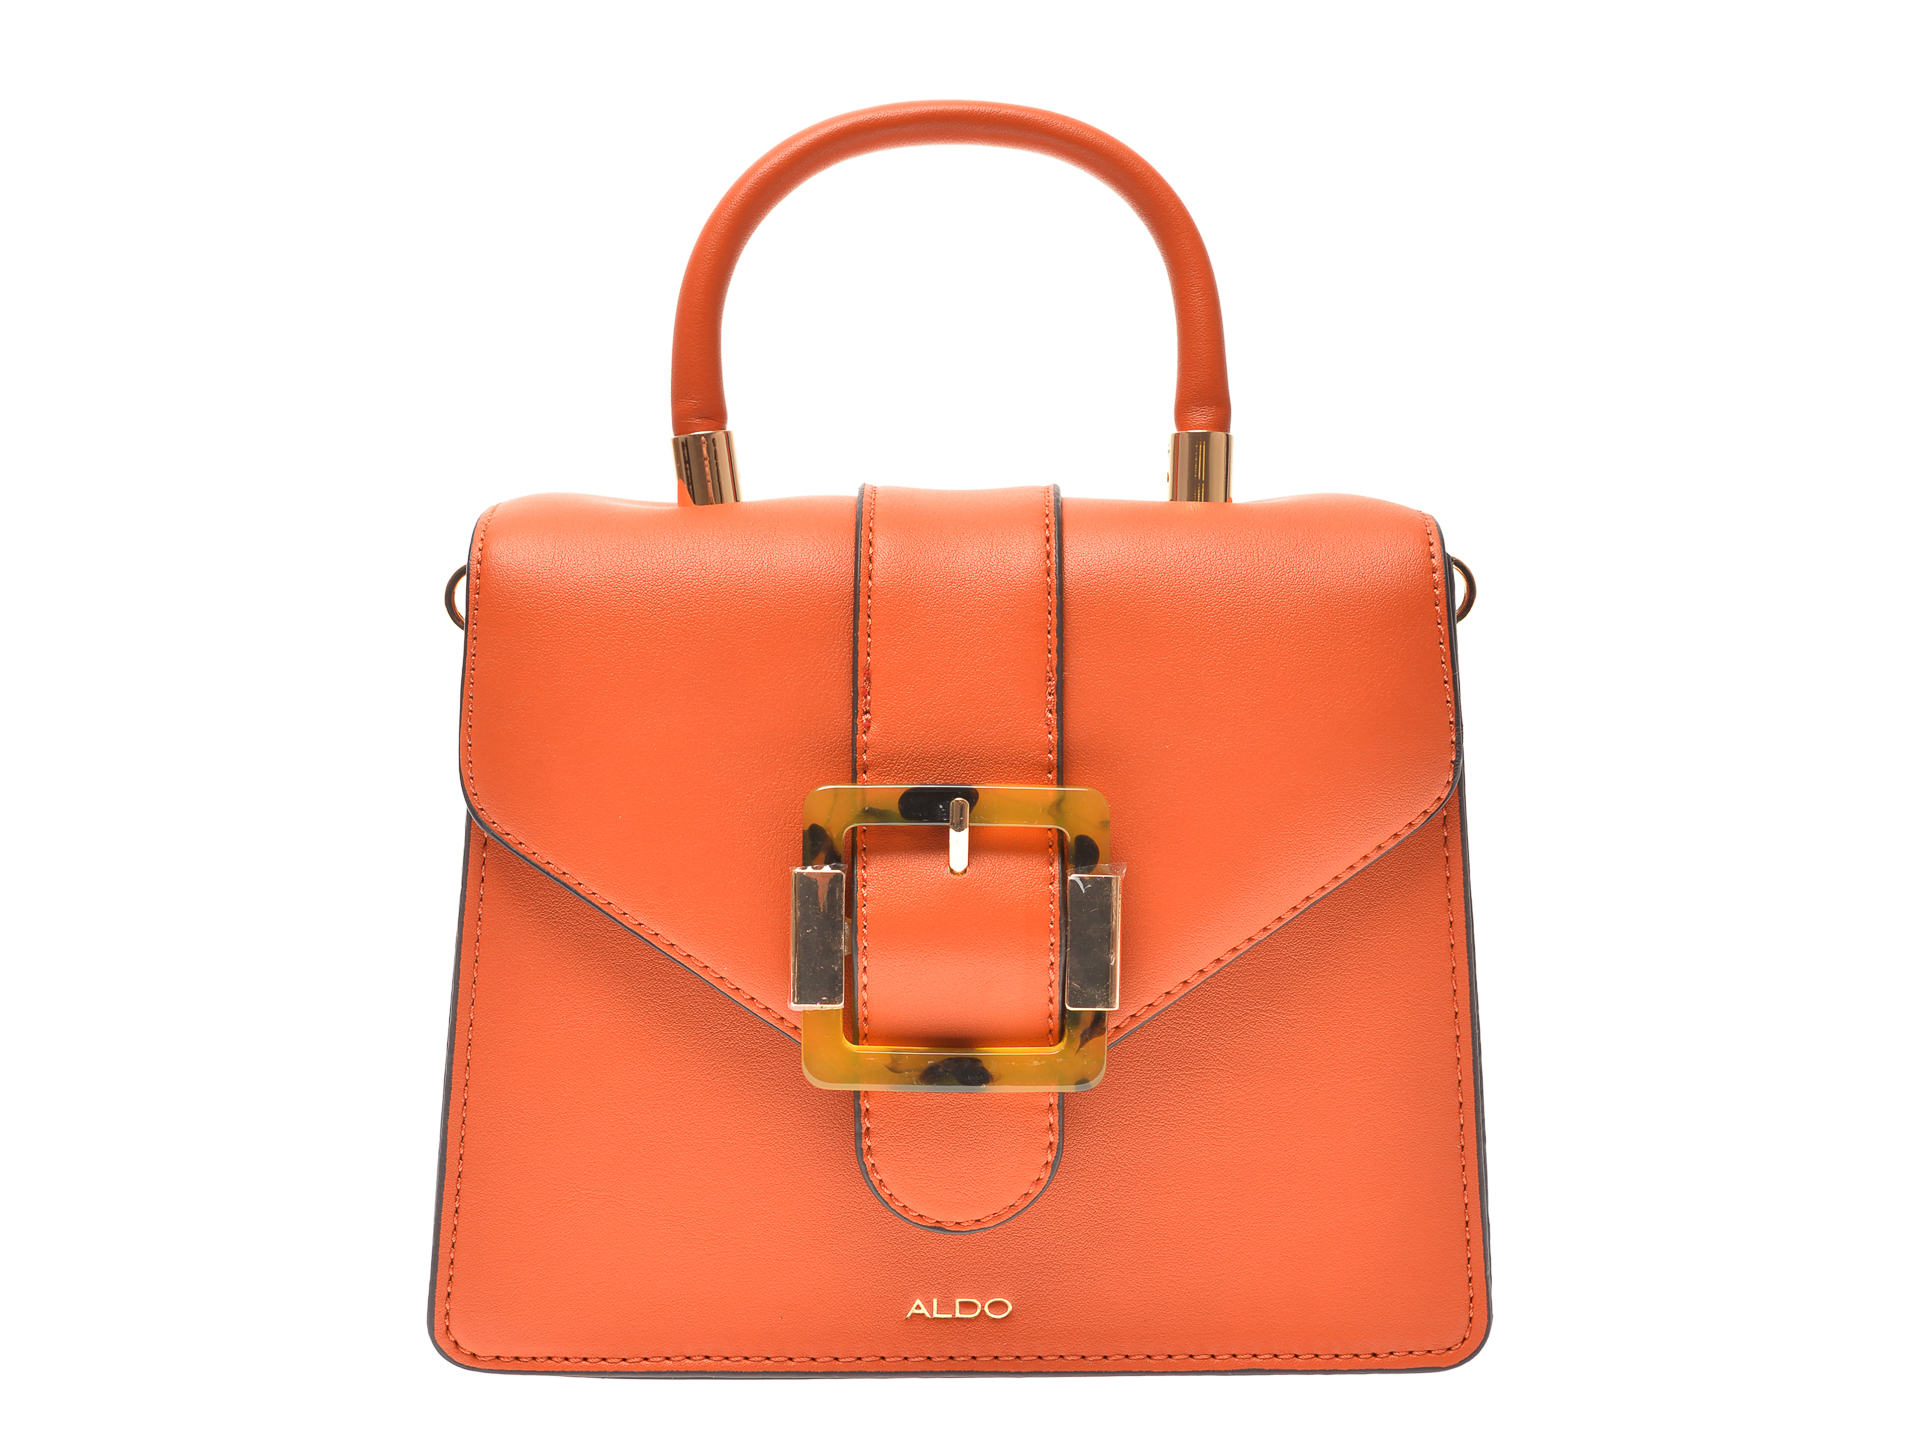 Poseta ALDO portocalie, Bertra801, din piele ecologica imagine otter.ro 2021